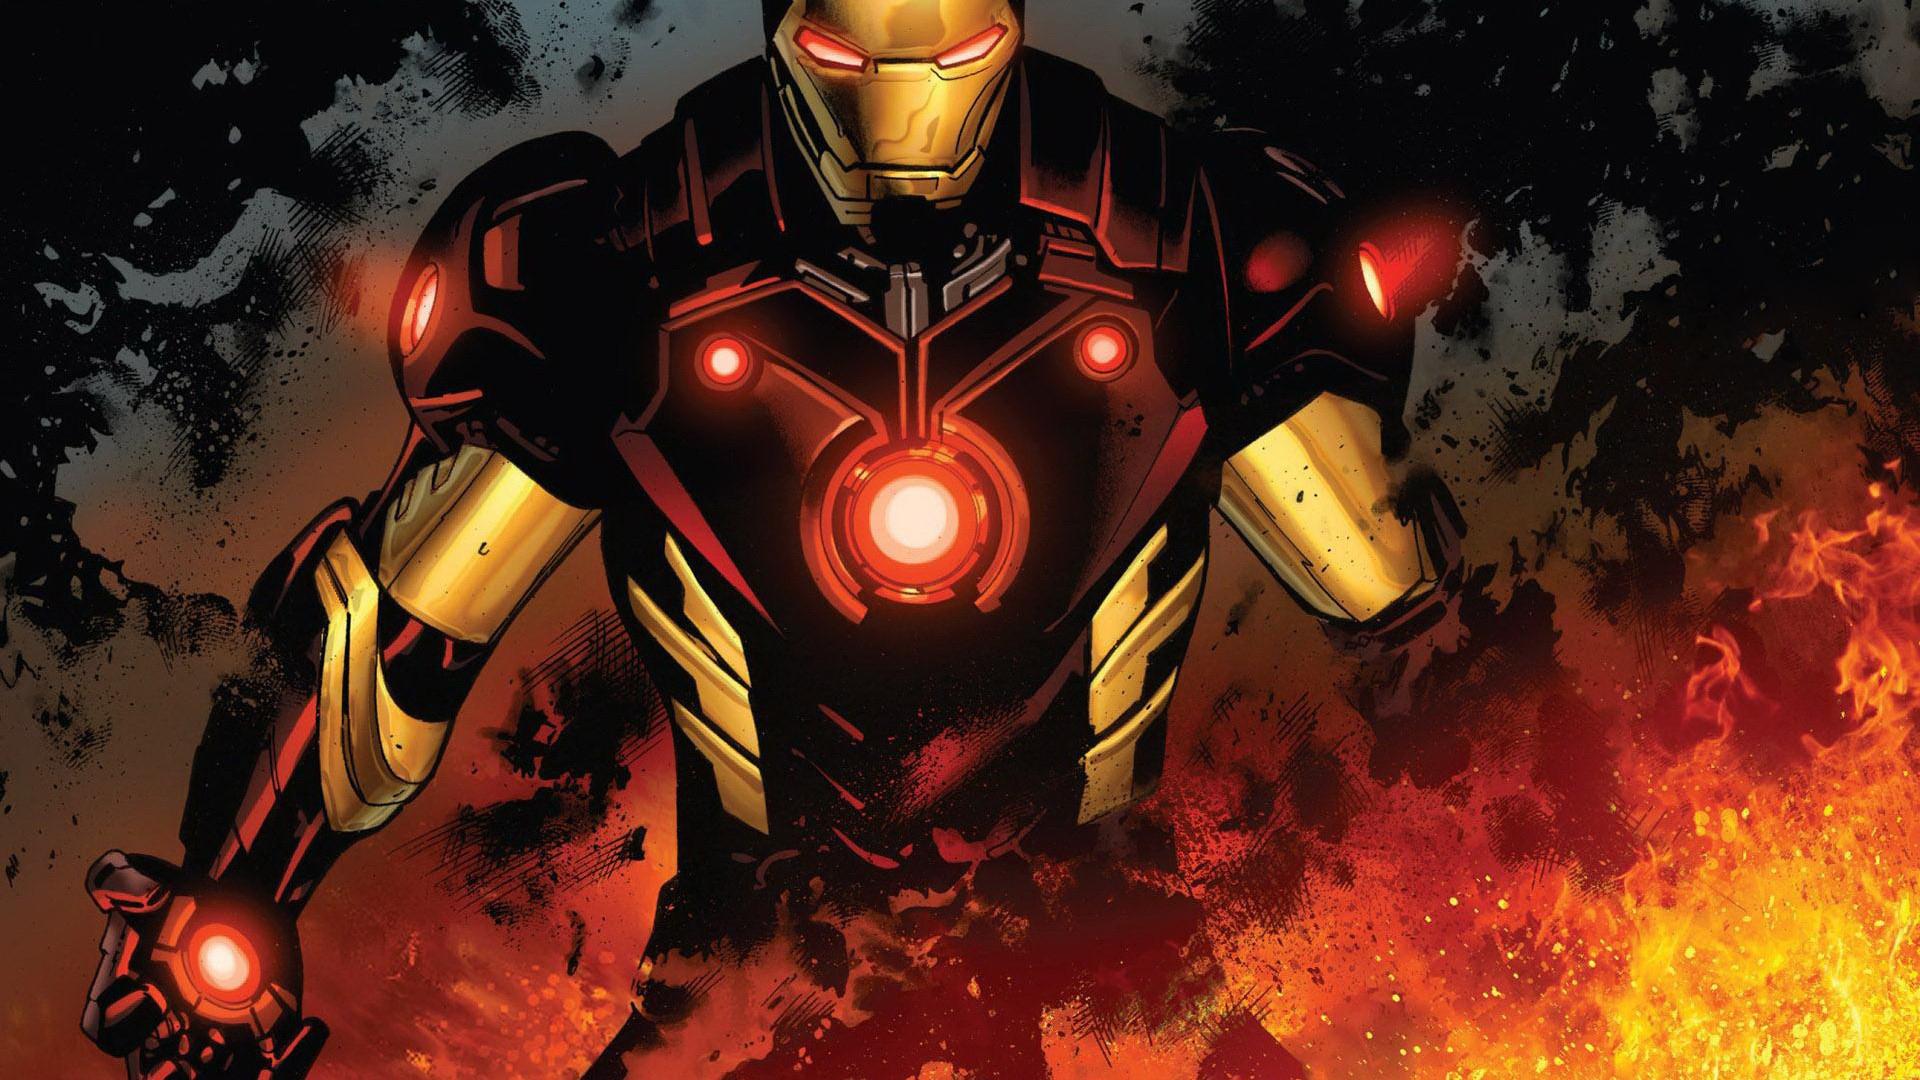 Iron man soundtrack mp3 download navisoftmore.